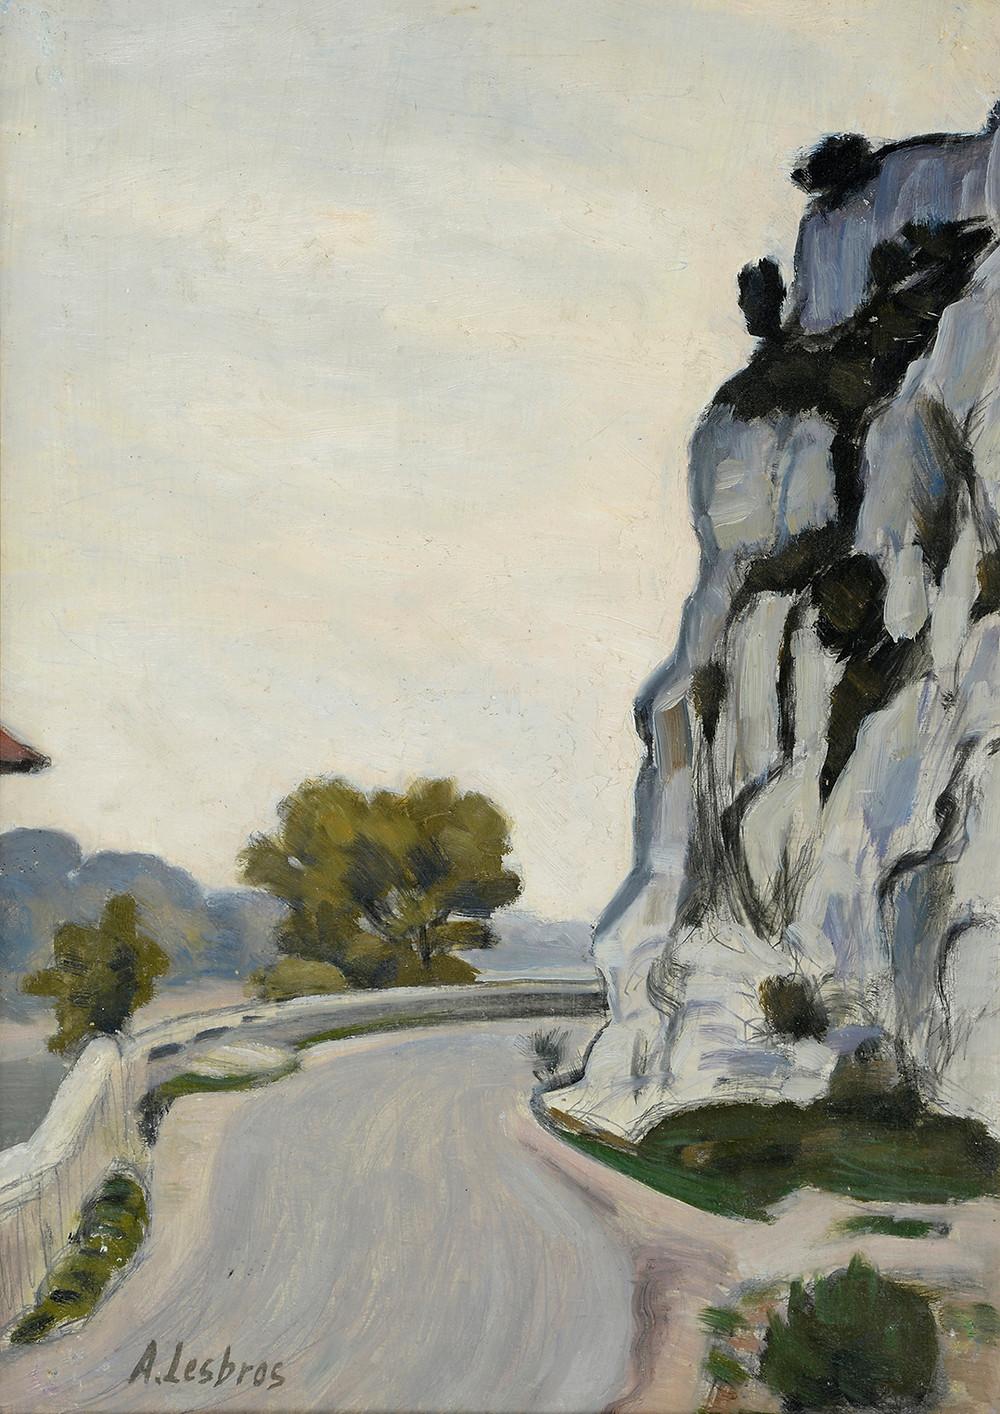 Peinture Alfred LESBROS (Avignon 1873-Avignon 1940)  Le rocher de la Justice Huile sur carton signé